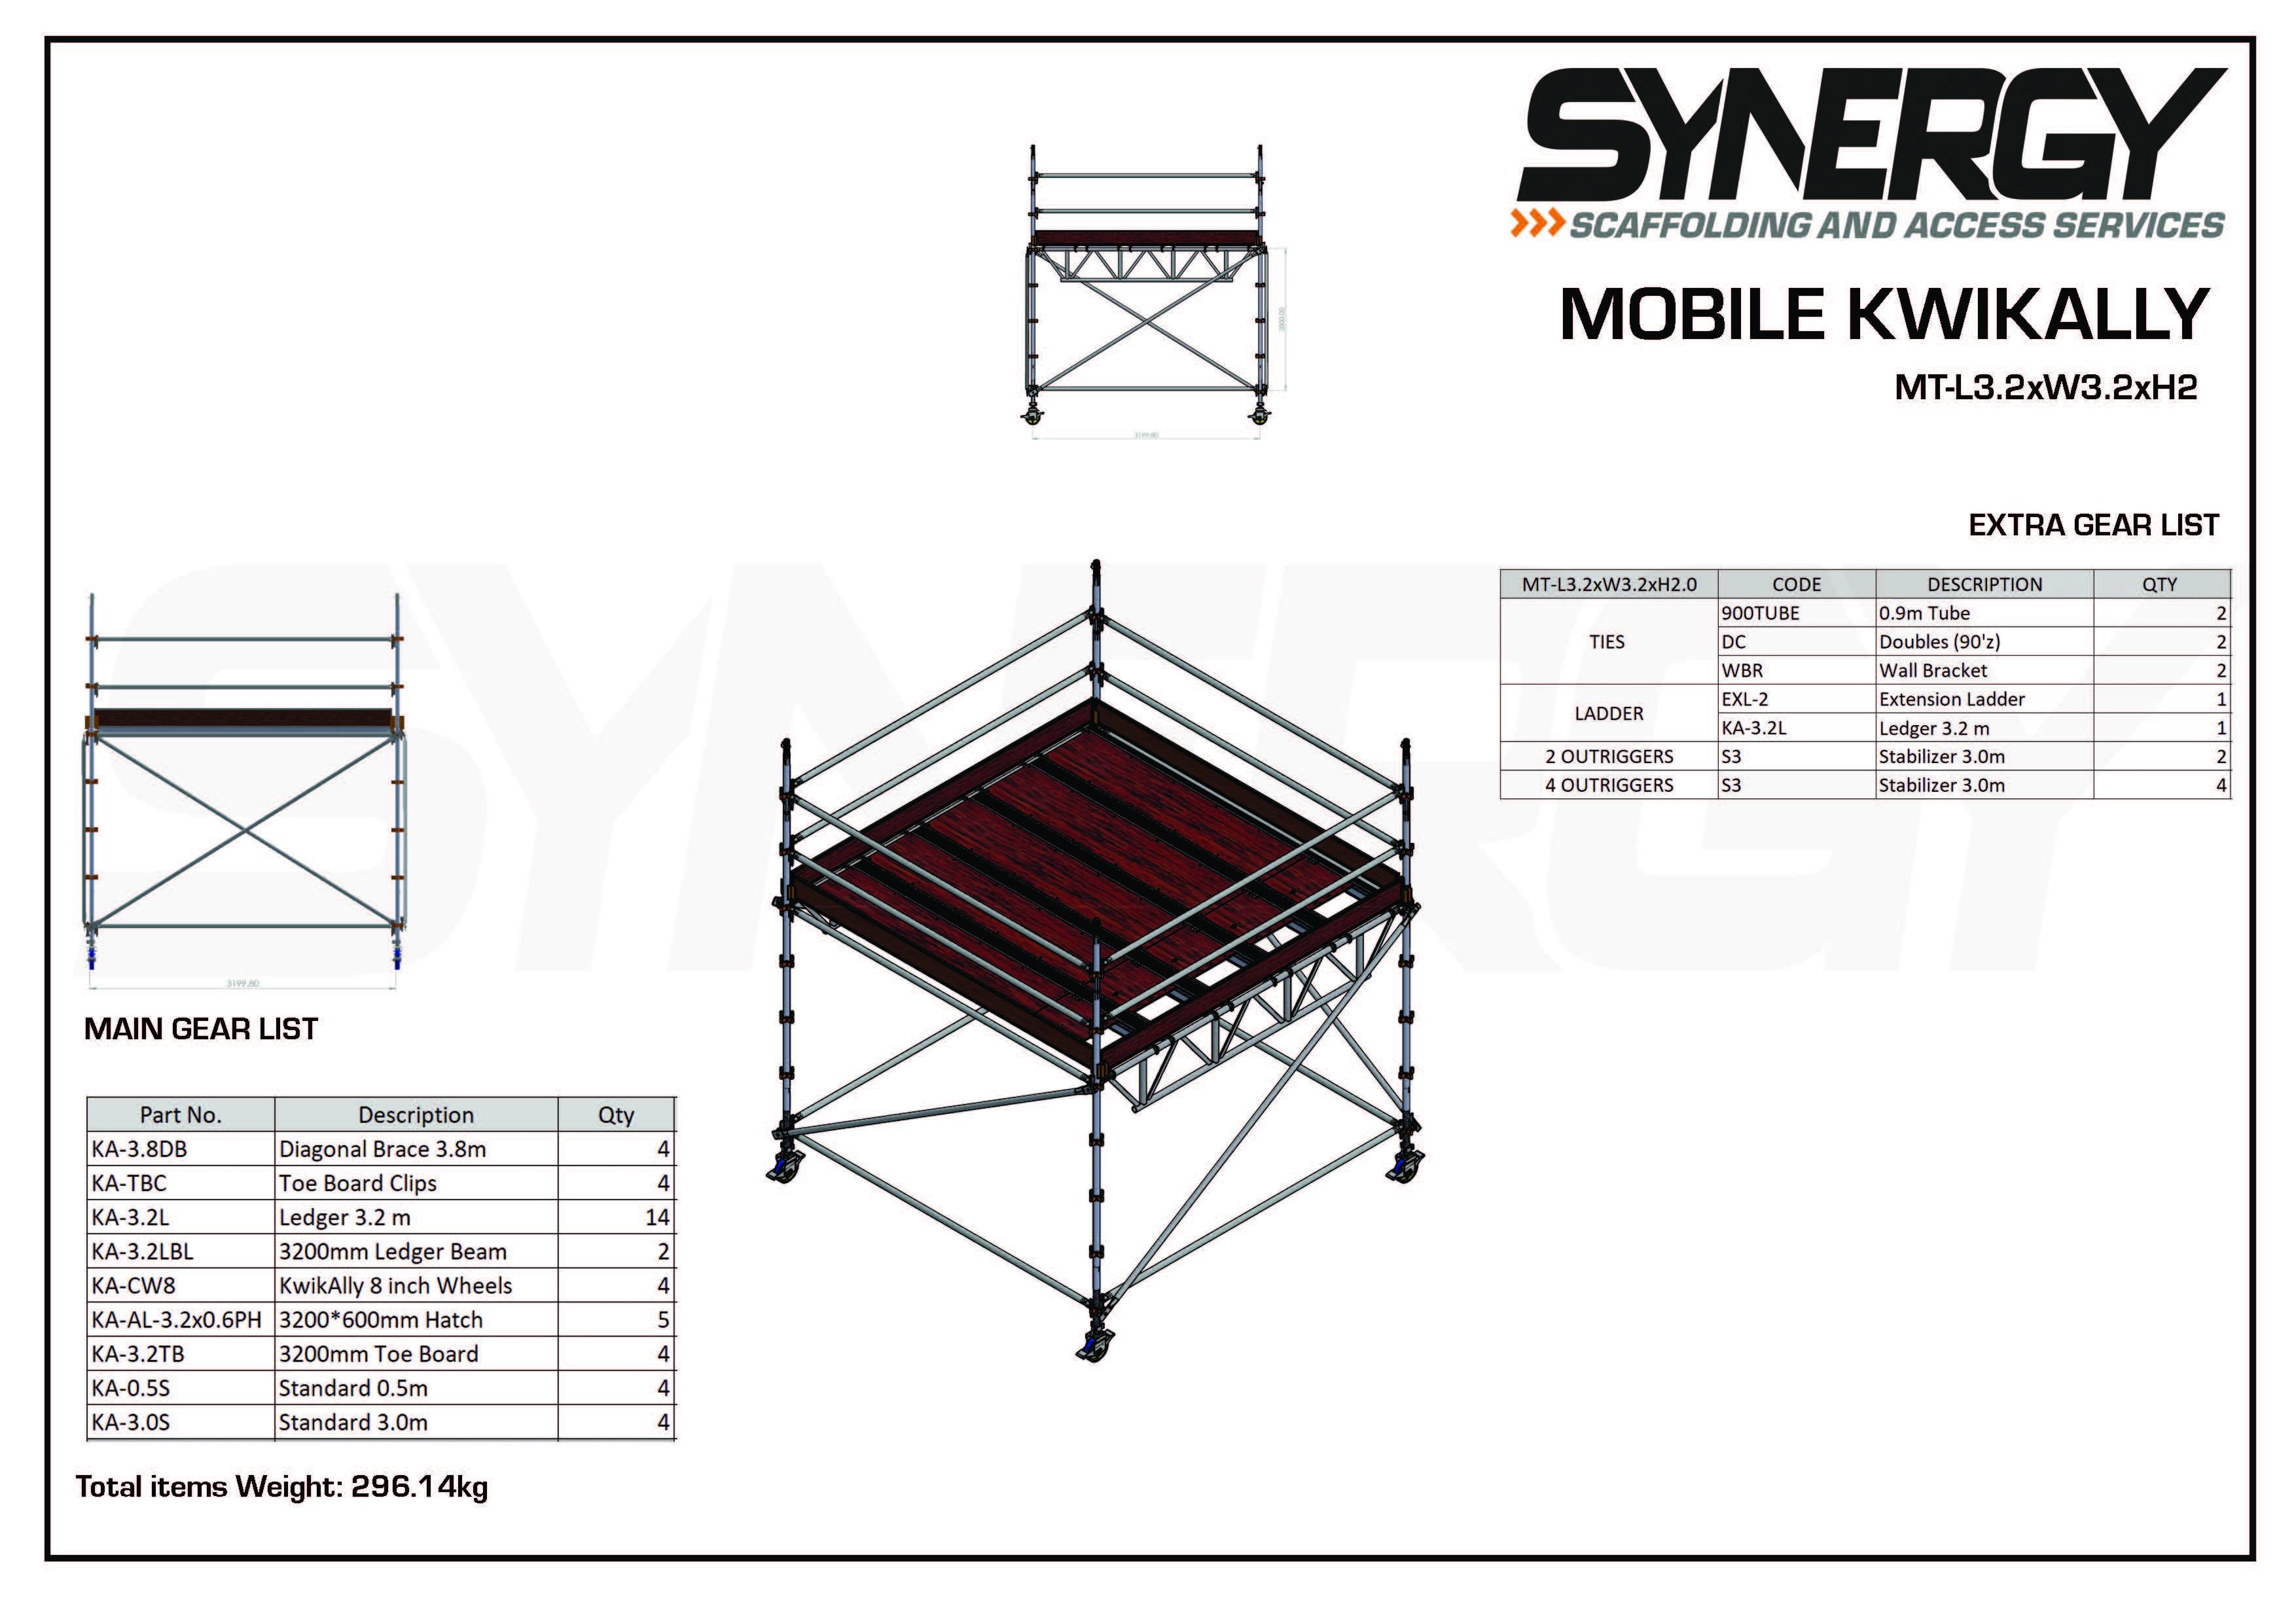 Kwikally Mobile 3.2m x 3.2m x 2m(Height)